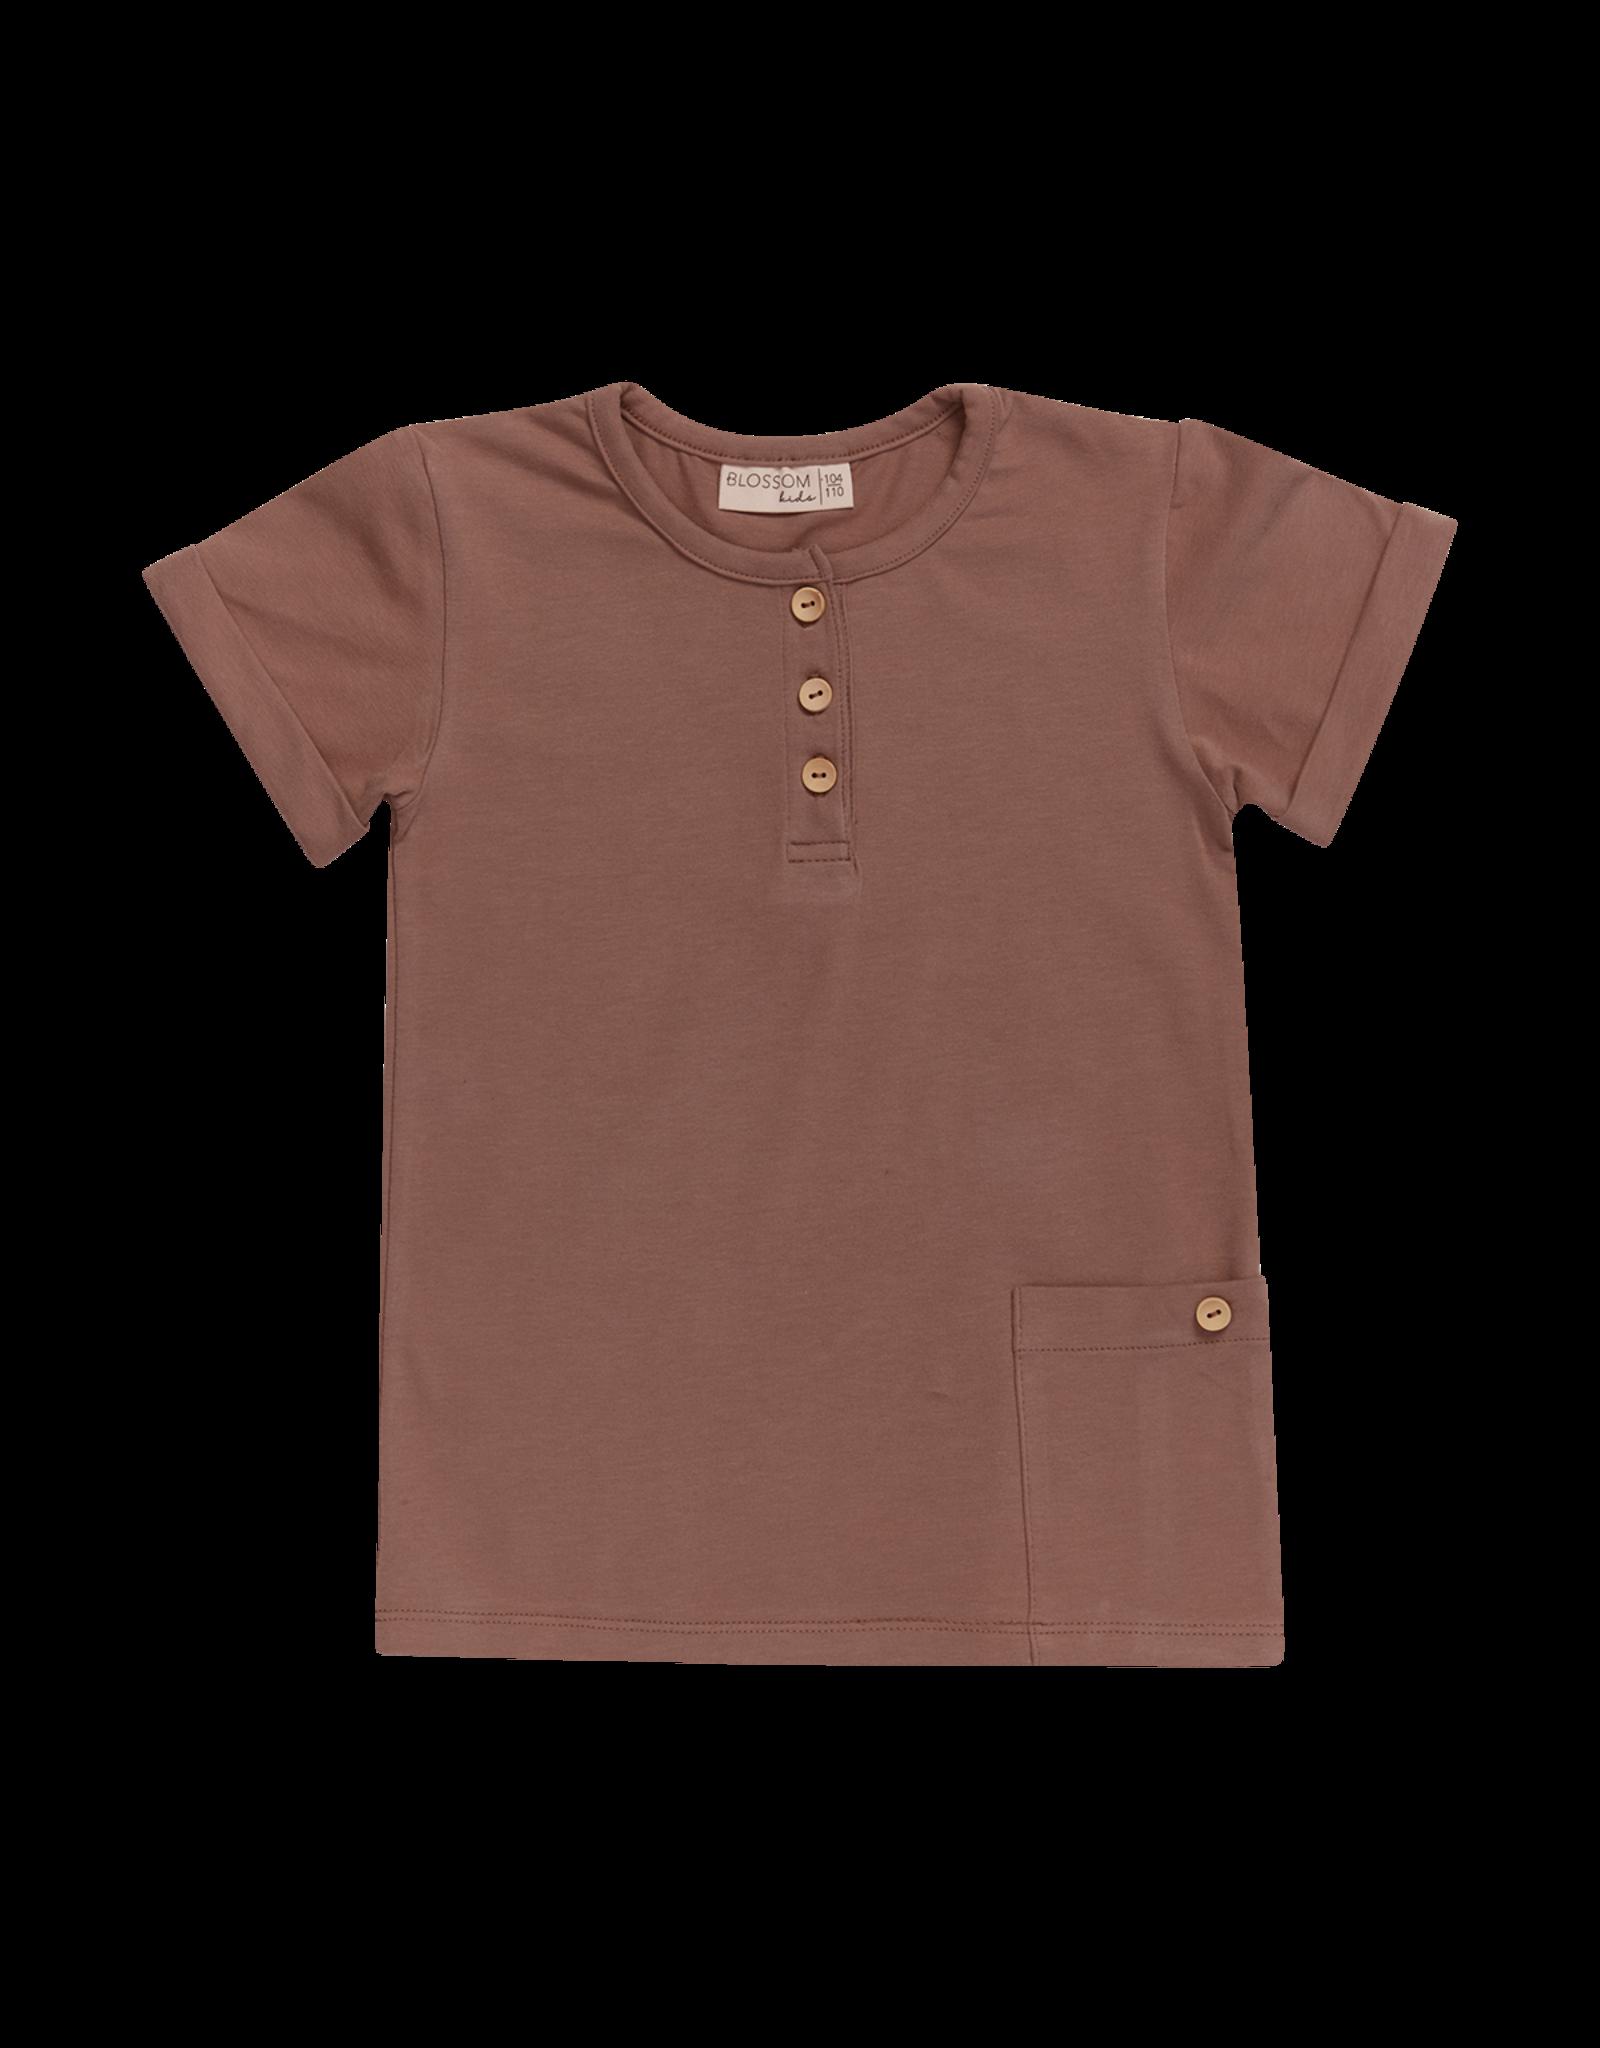 Blossom Kids Shirt - Short sleeve - Creamy Cacao